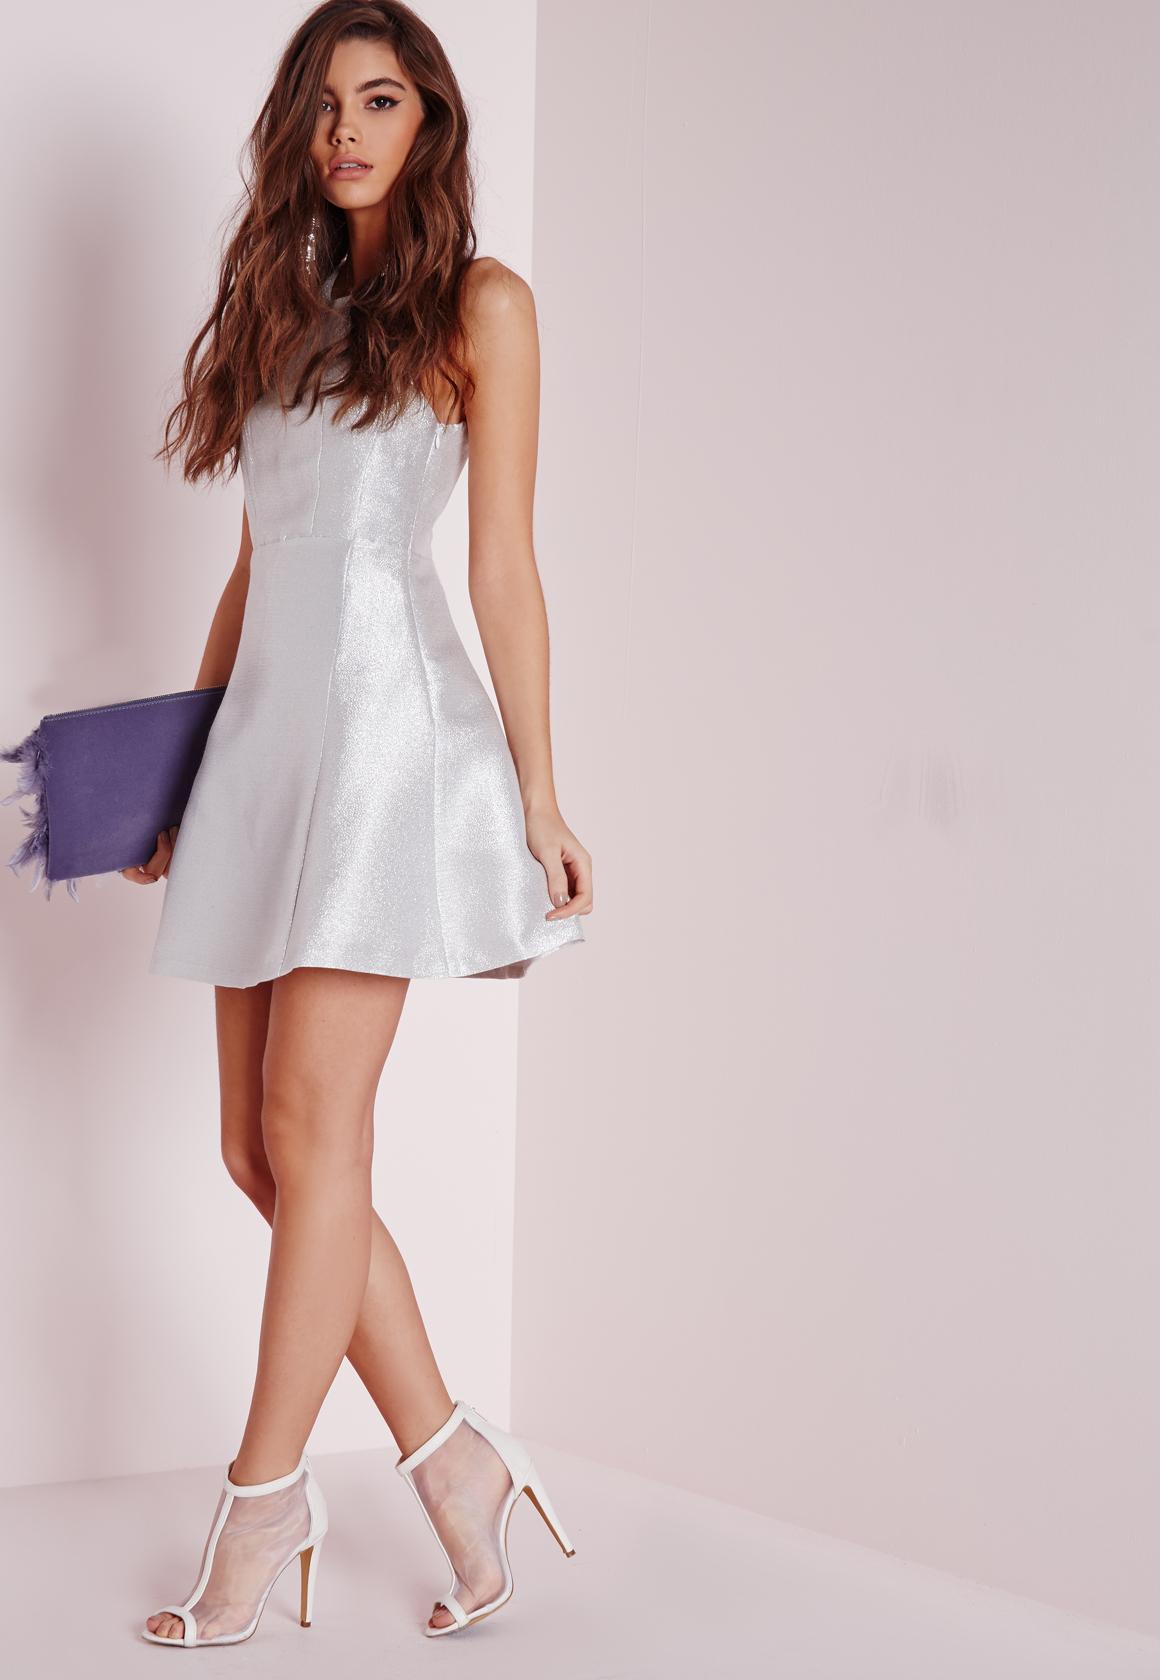 dbb251b20a6c Lyst - Missguided Glitter Skater Dress Silver in White